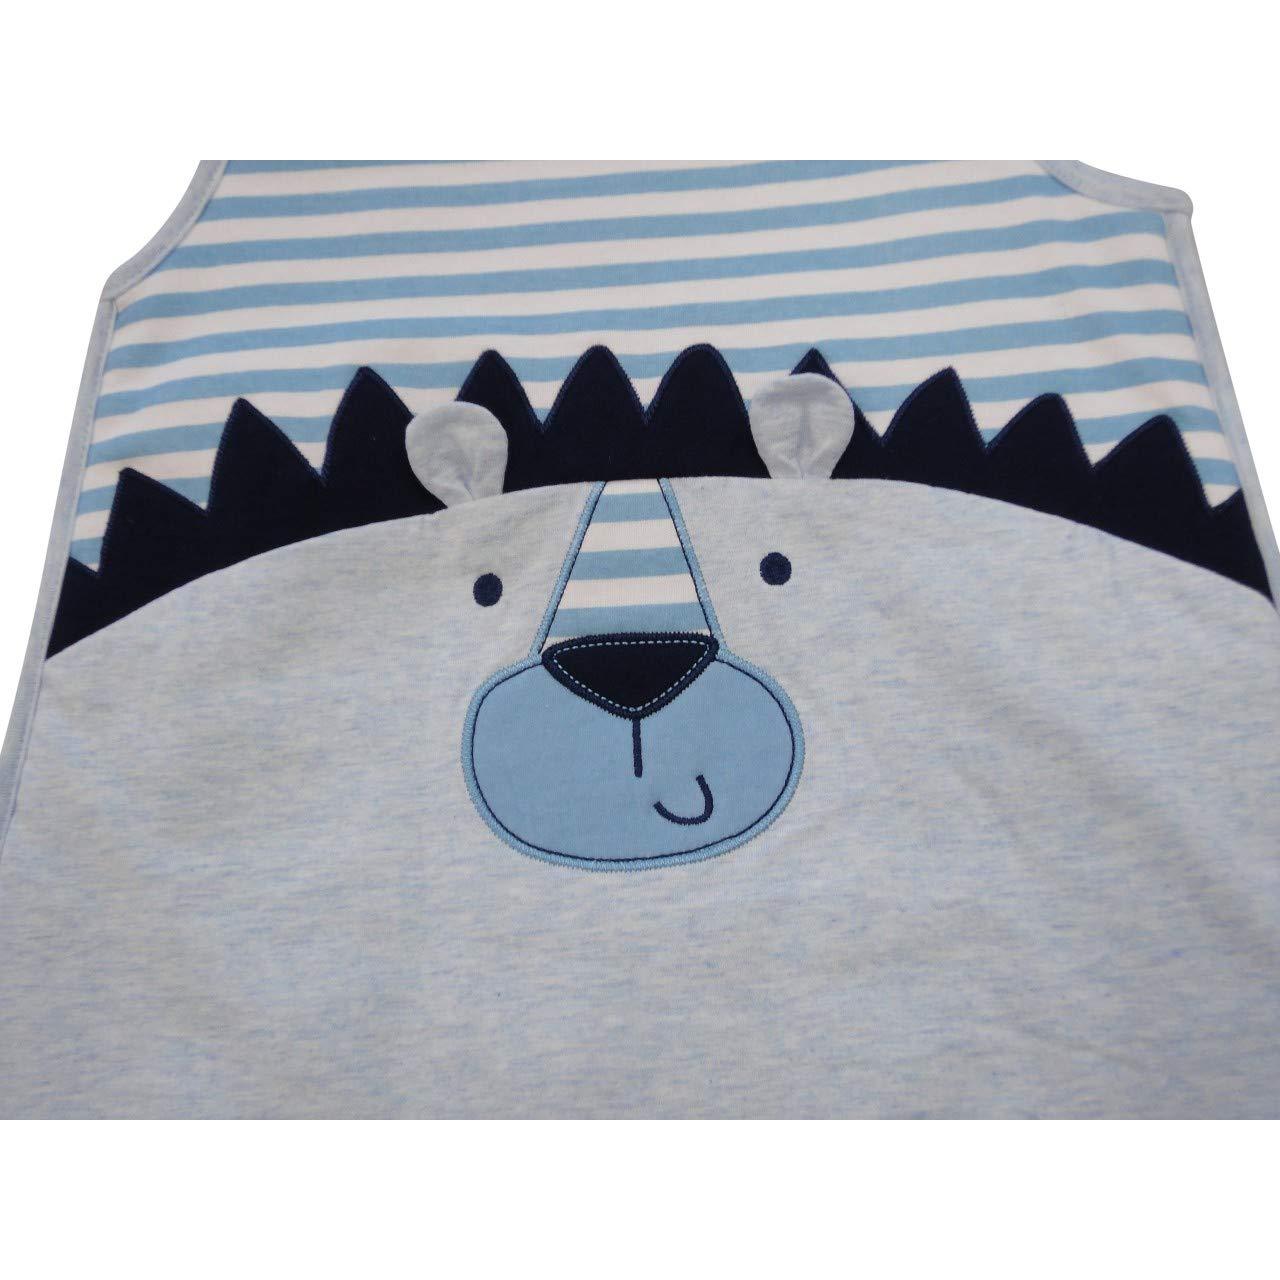 Pitter Patter - Saco de dormir para bebé (2,5 tog, para niños y niñas, 6 a 24 meses) azul Blue Lion Talla:6-12 meses: Amazon.es: Bebé